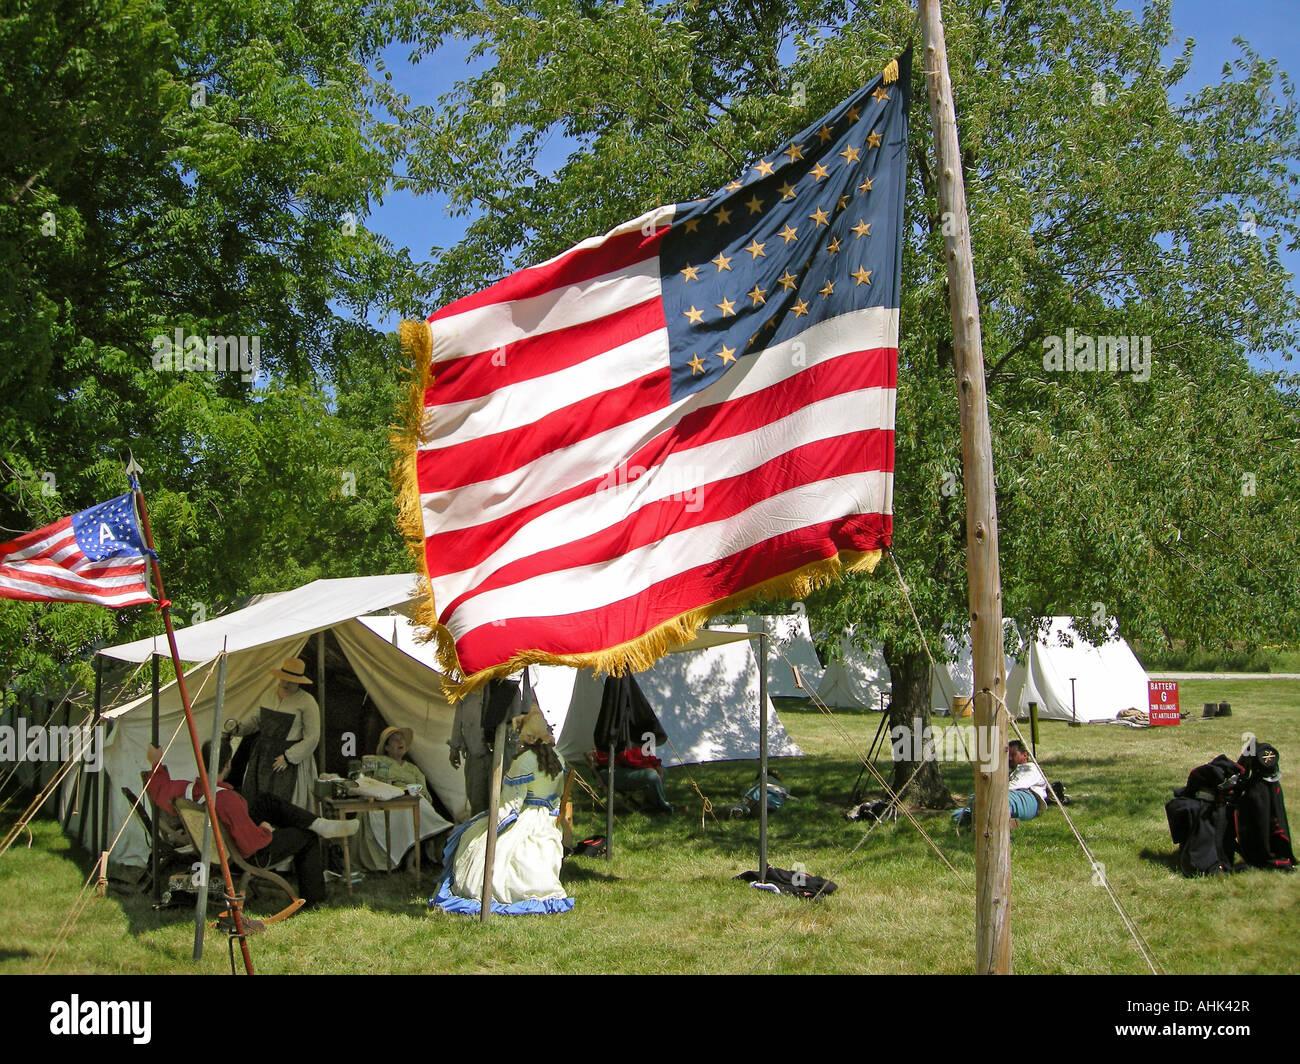 US Union Civil War Artillary Re-enactment - Stock Image